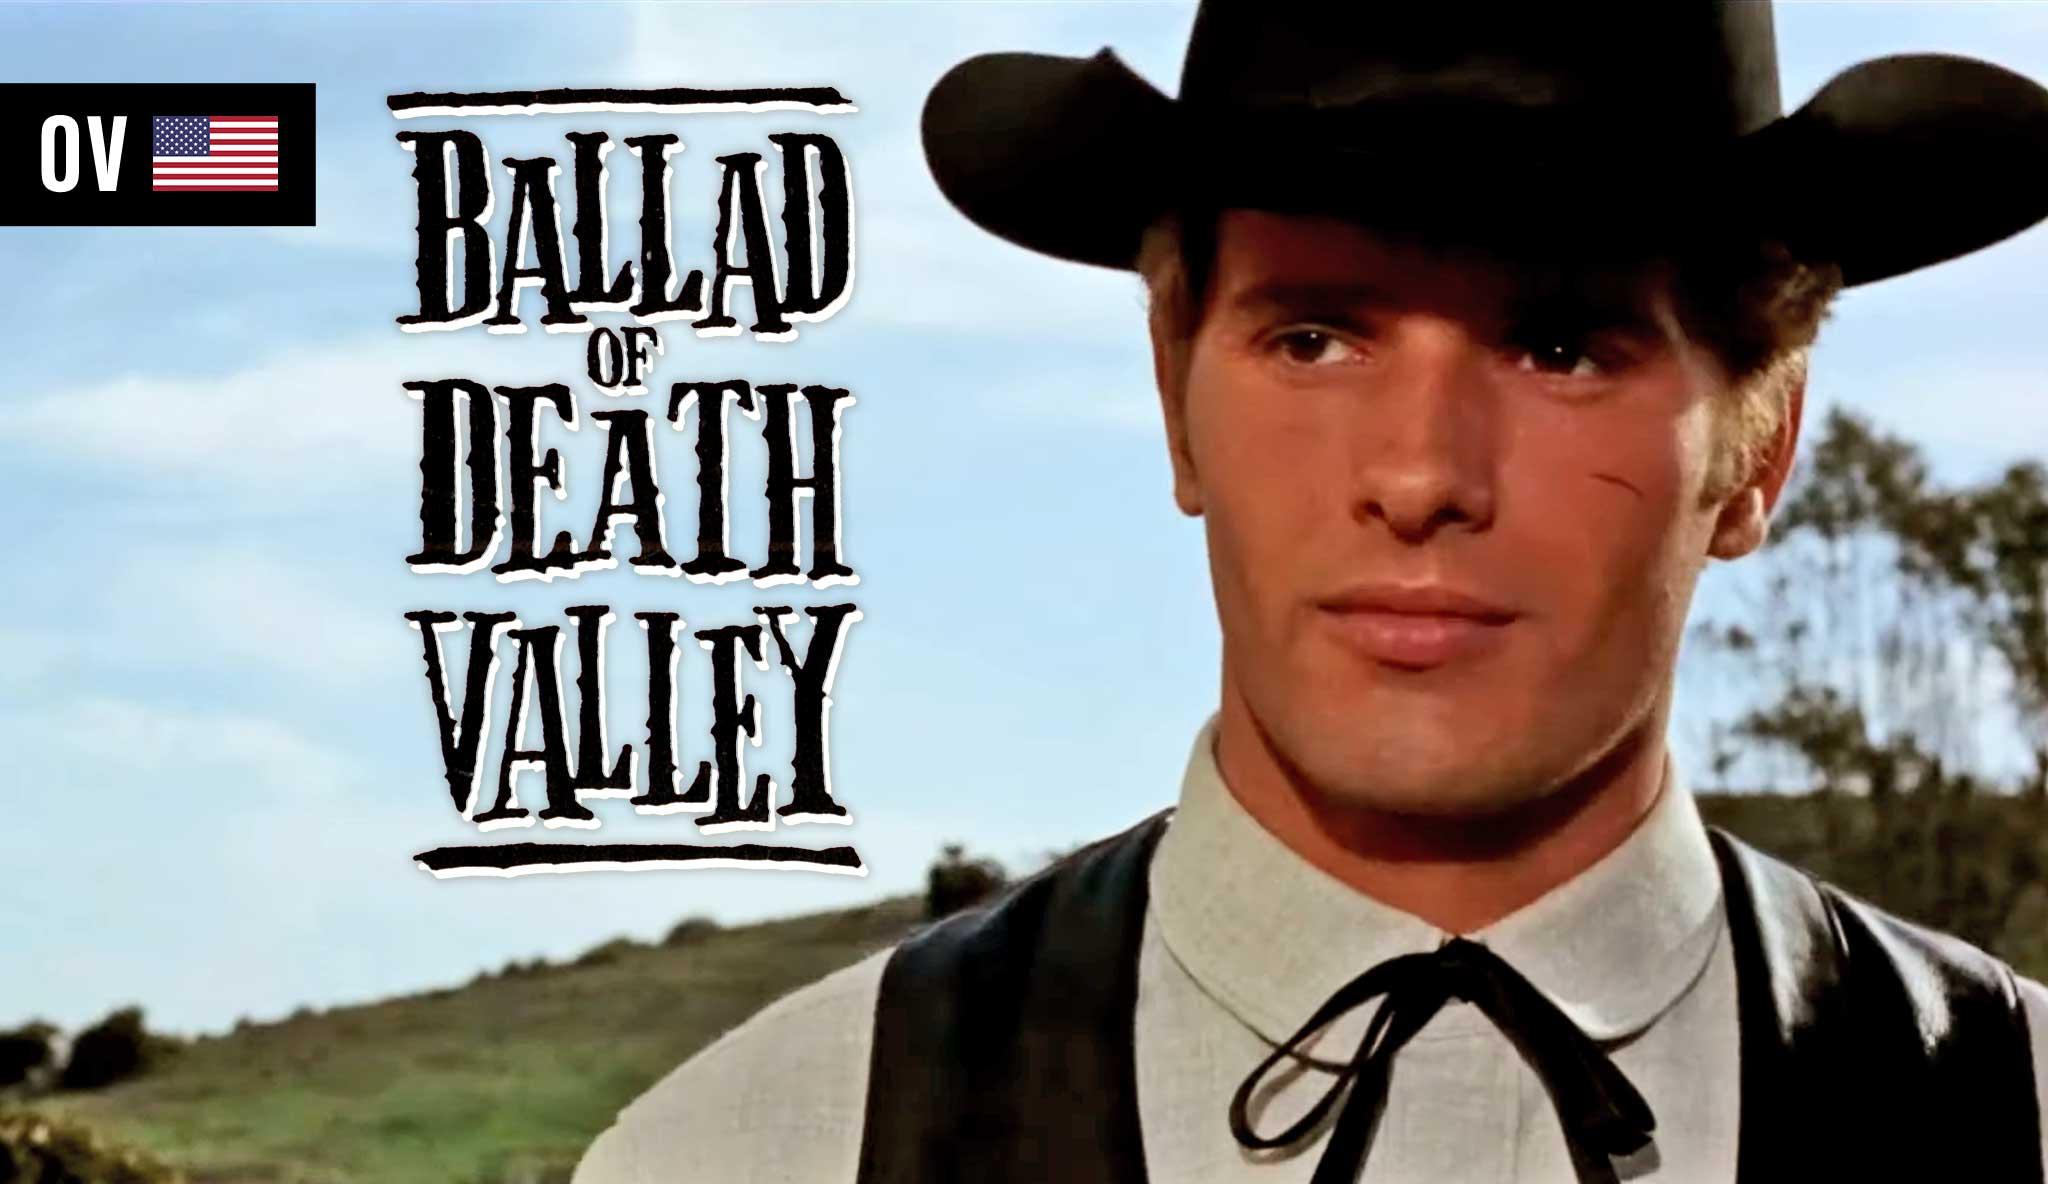 ballad-of-death-valley\header.jpg